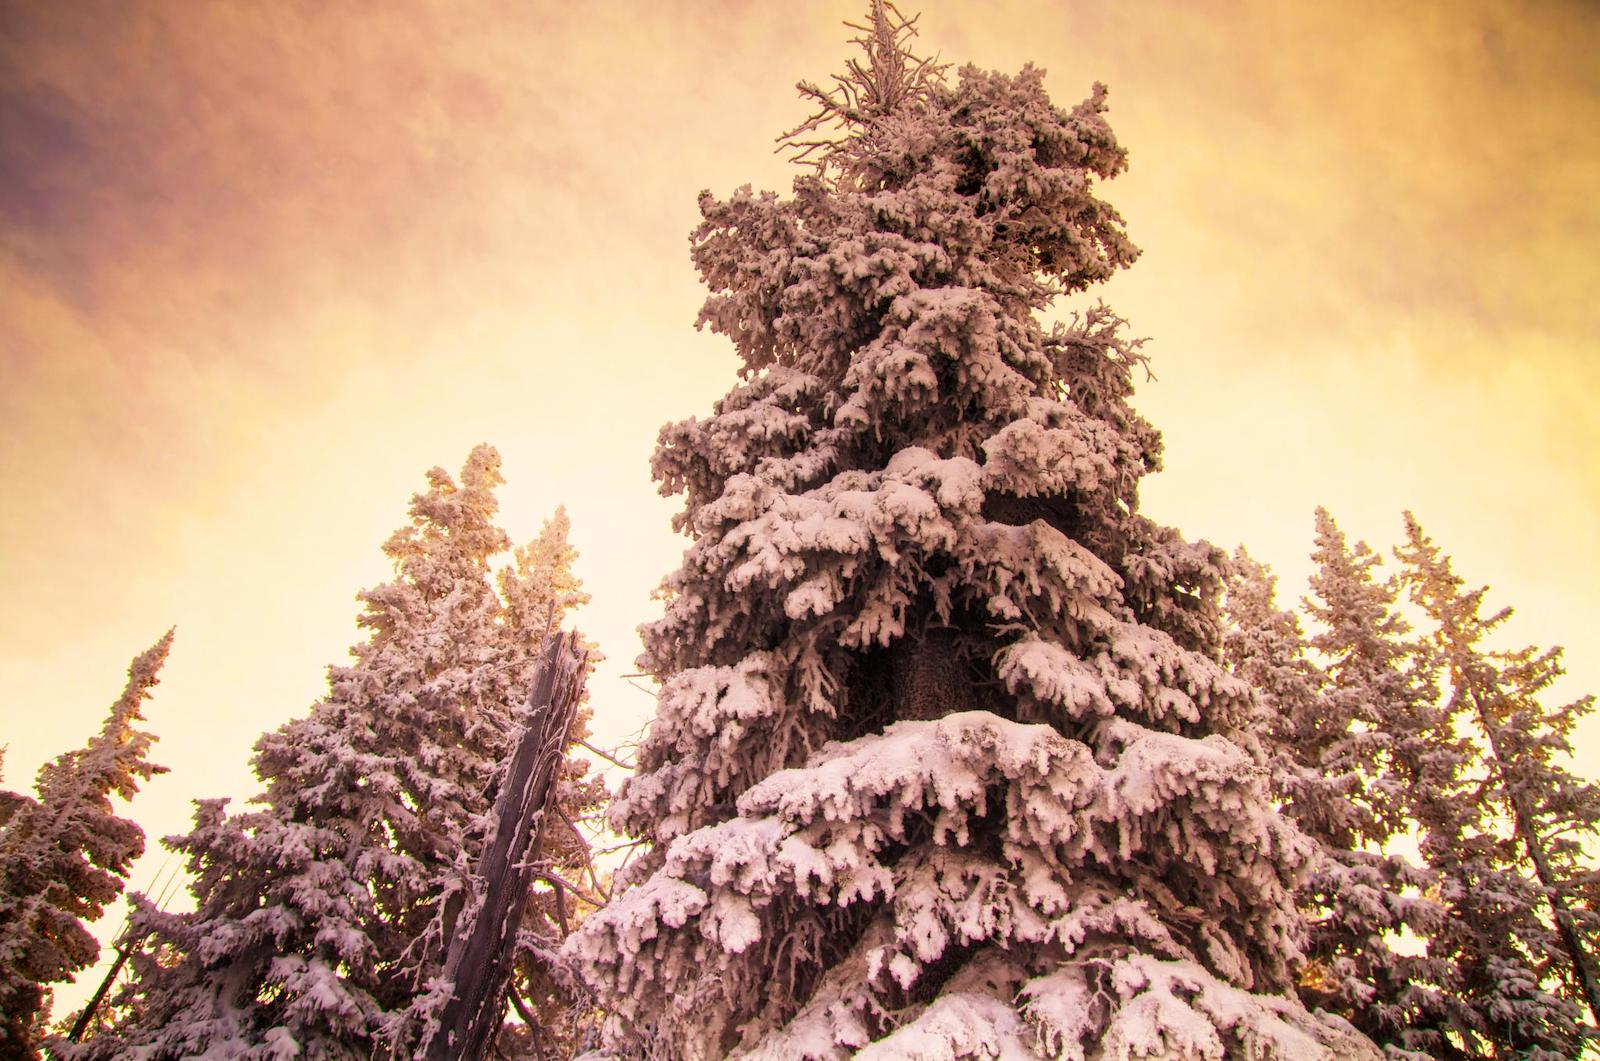 Vail Ski Resort Blue Sky Basin Evergreen Trees Covered in Snow